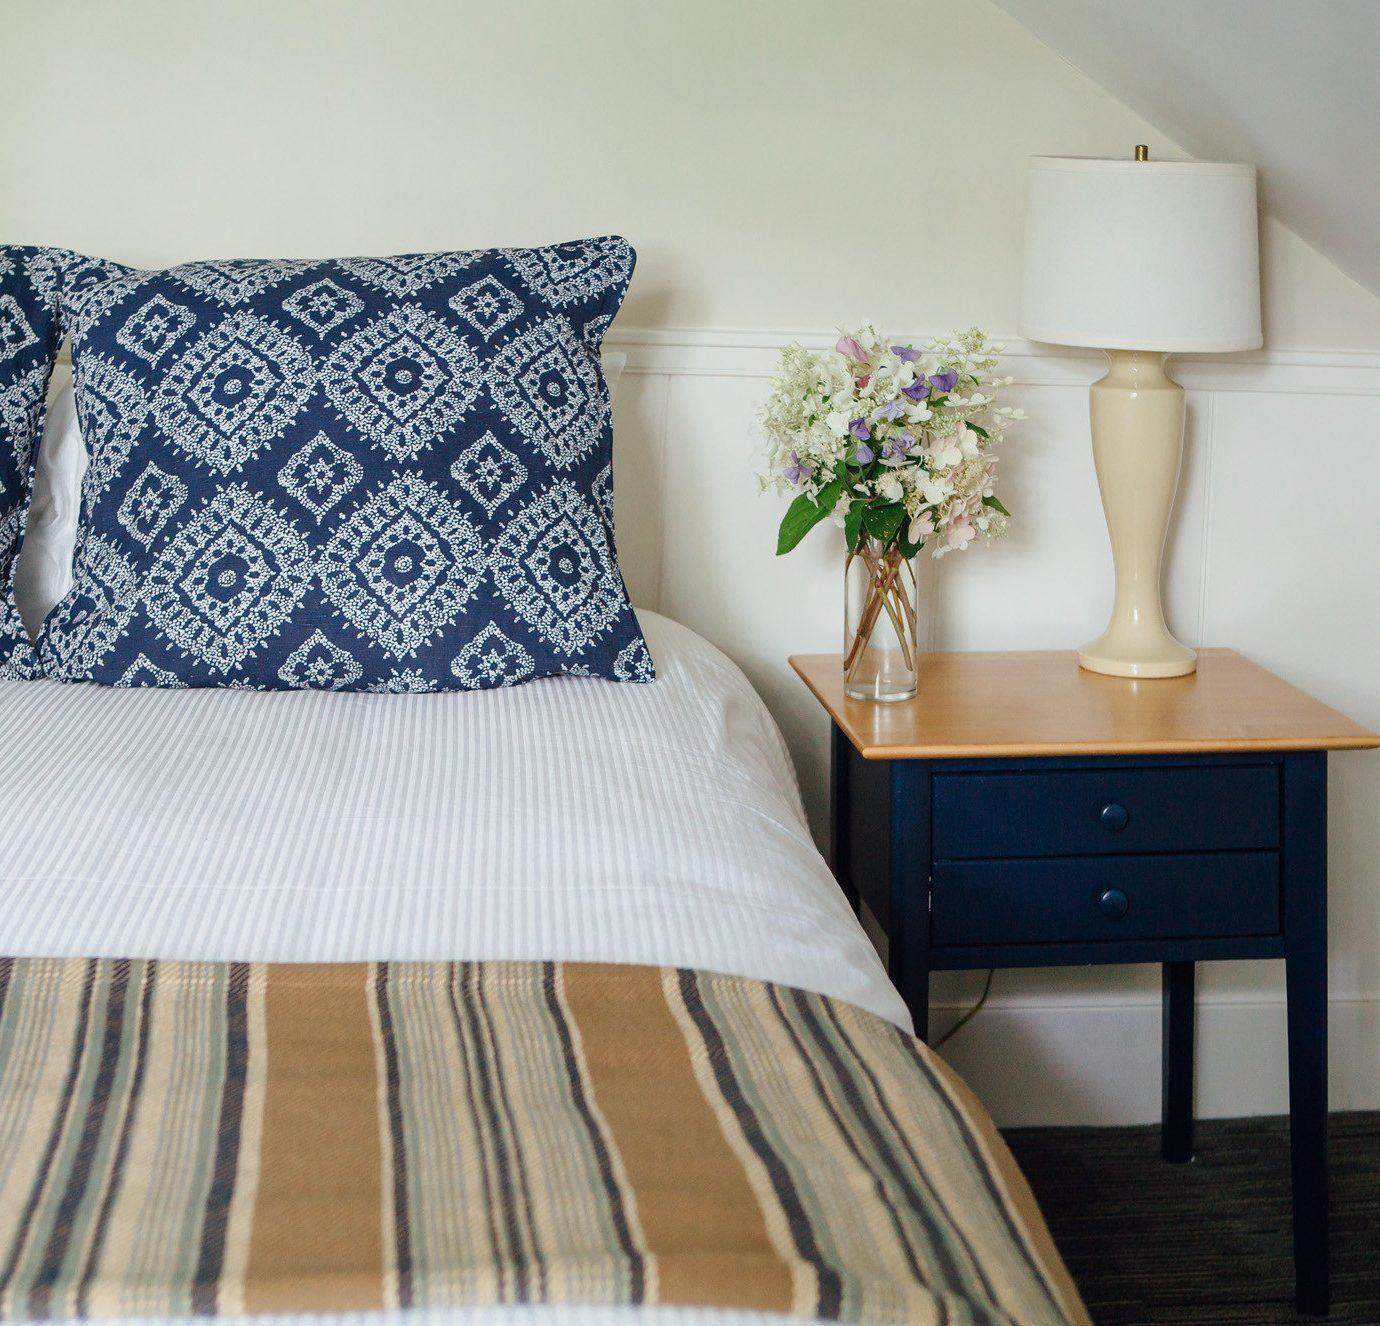 Bedroom pillow duvet cover bed sheet hardwood white bed frame cottage textile lamp